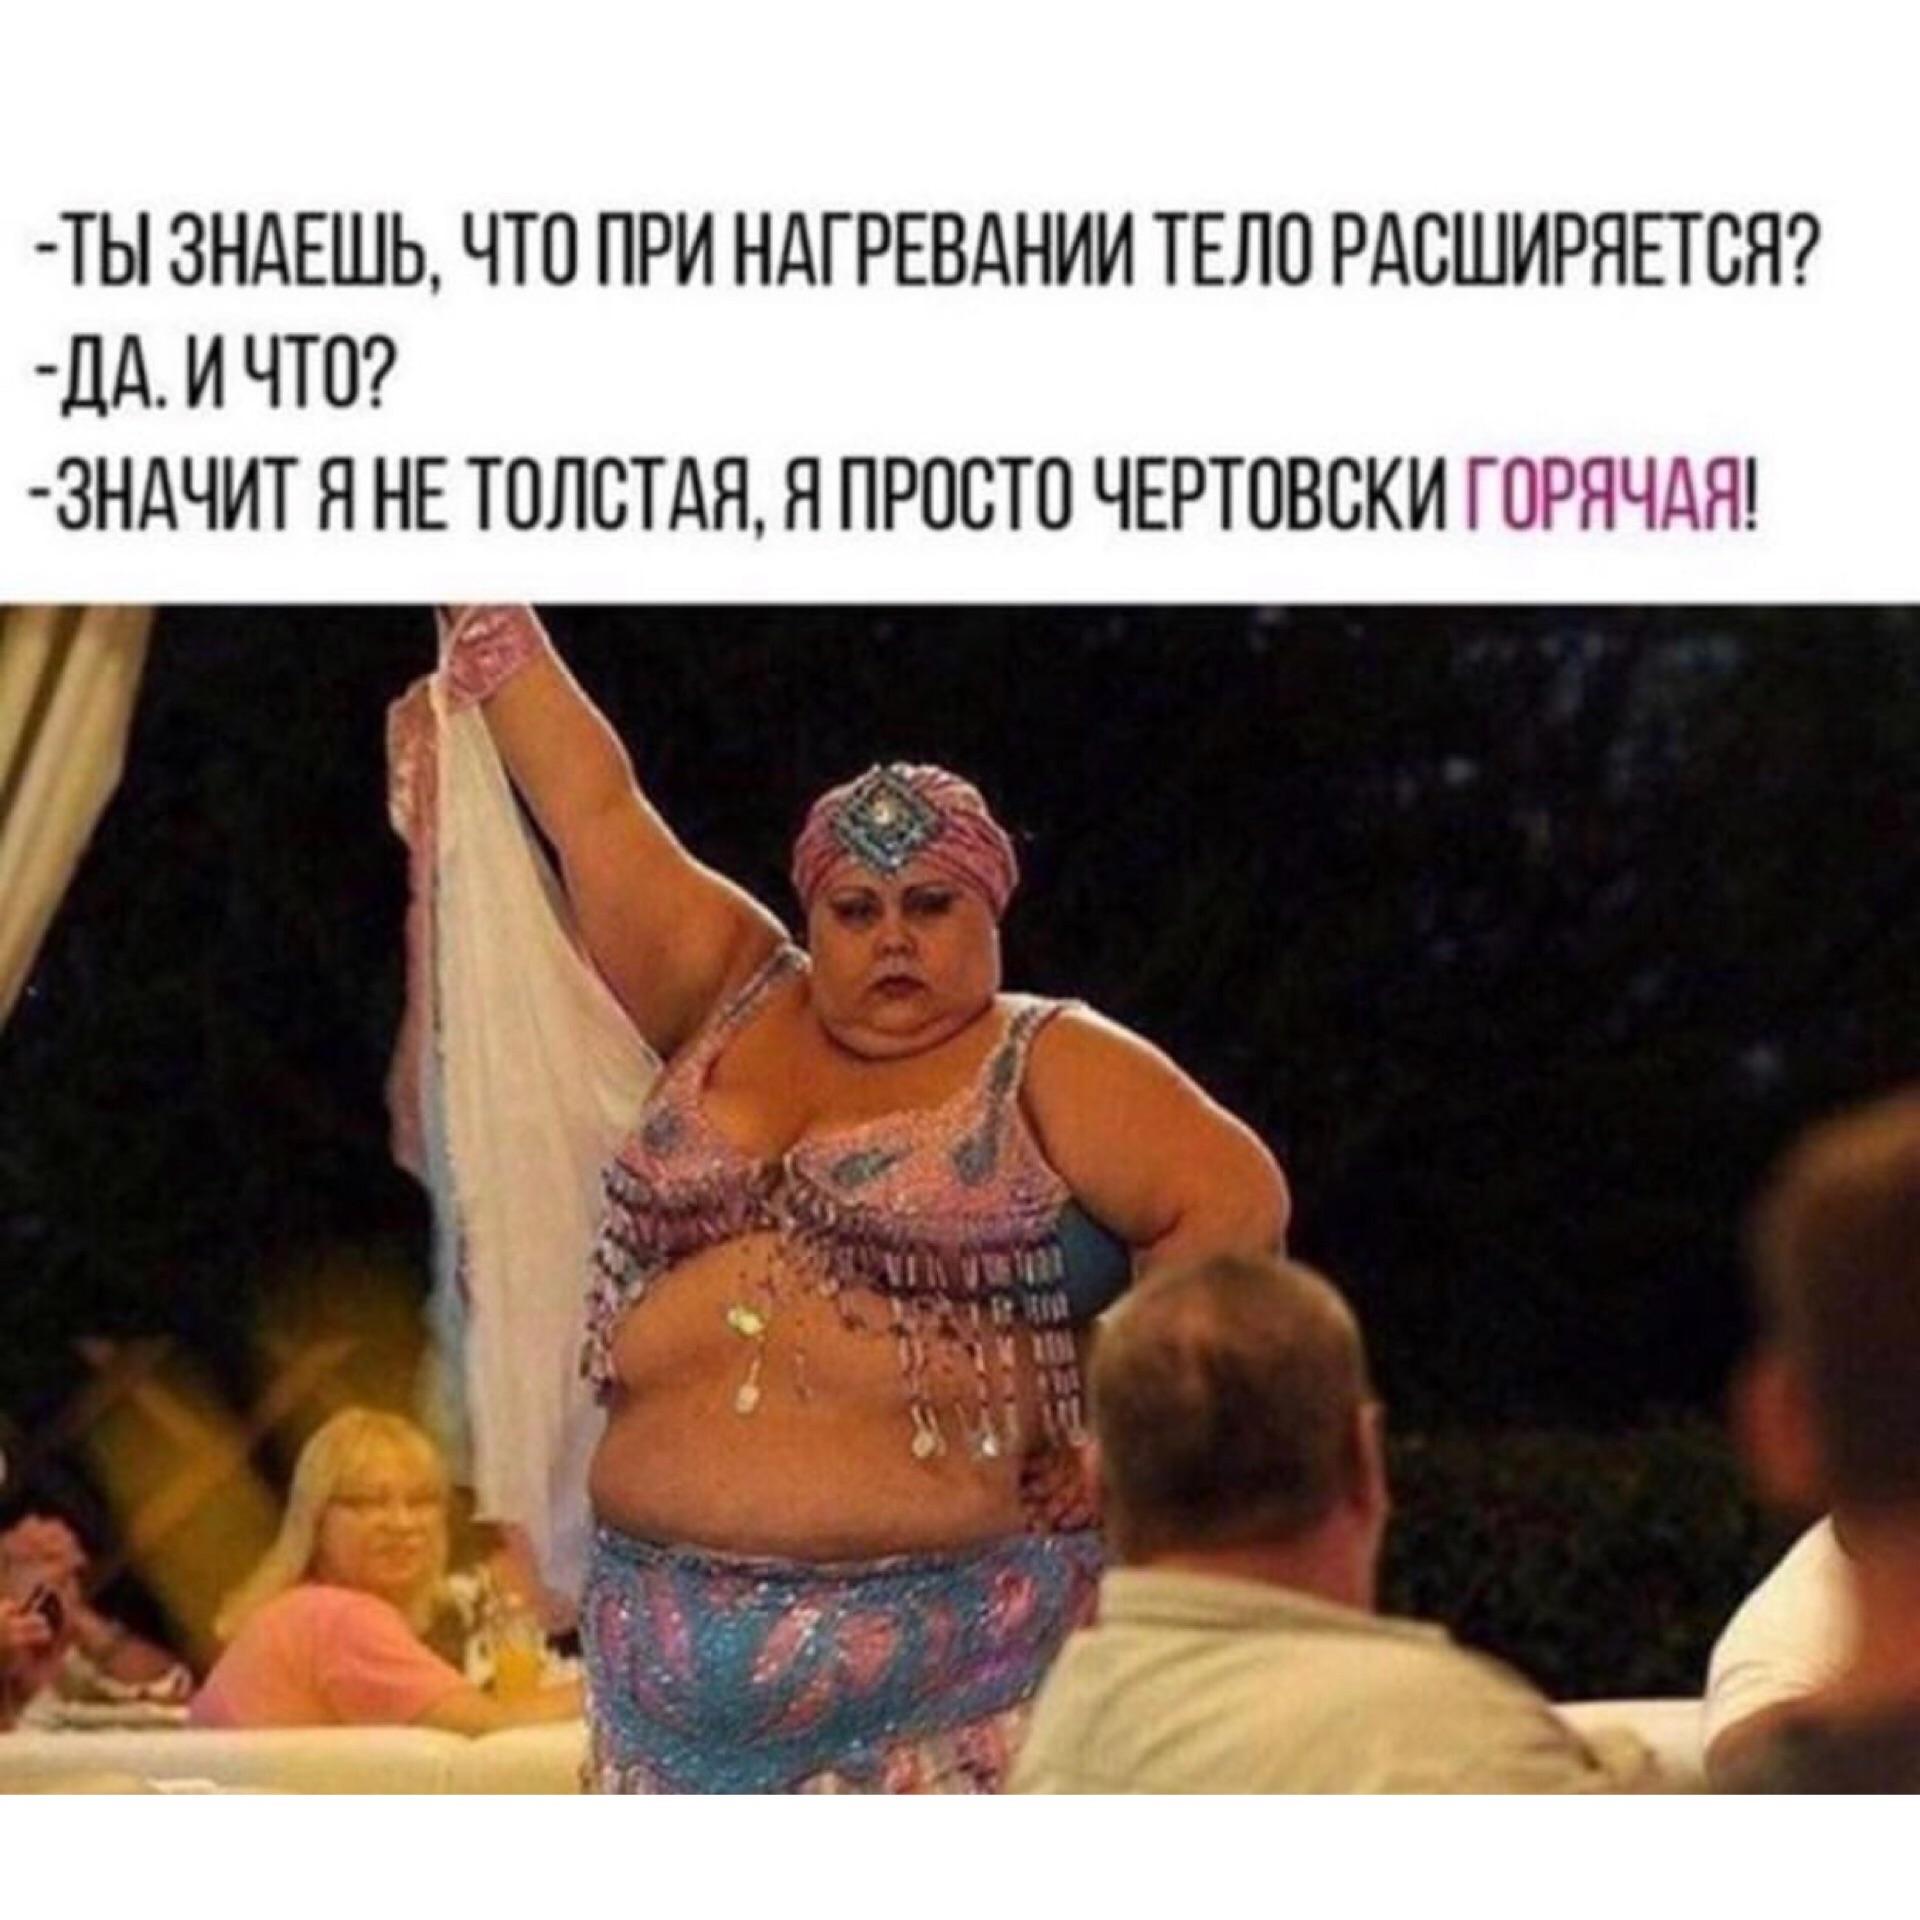 Картинки про толстух с надписями